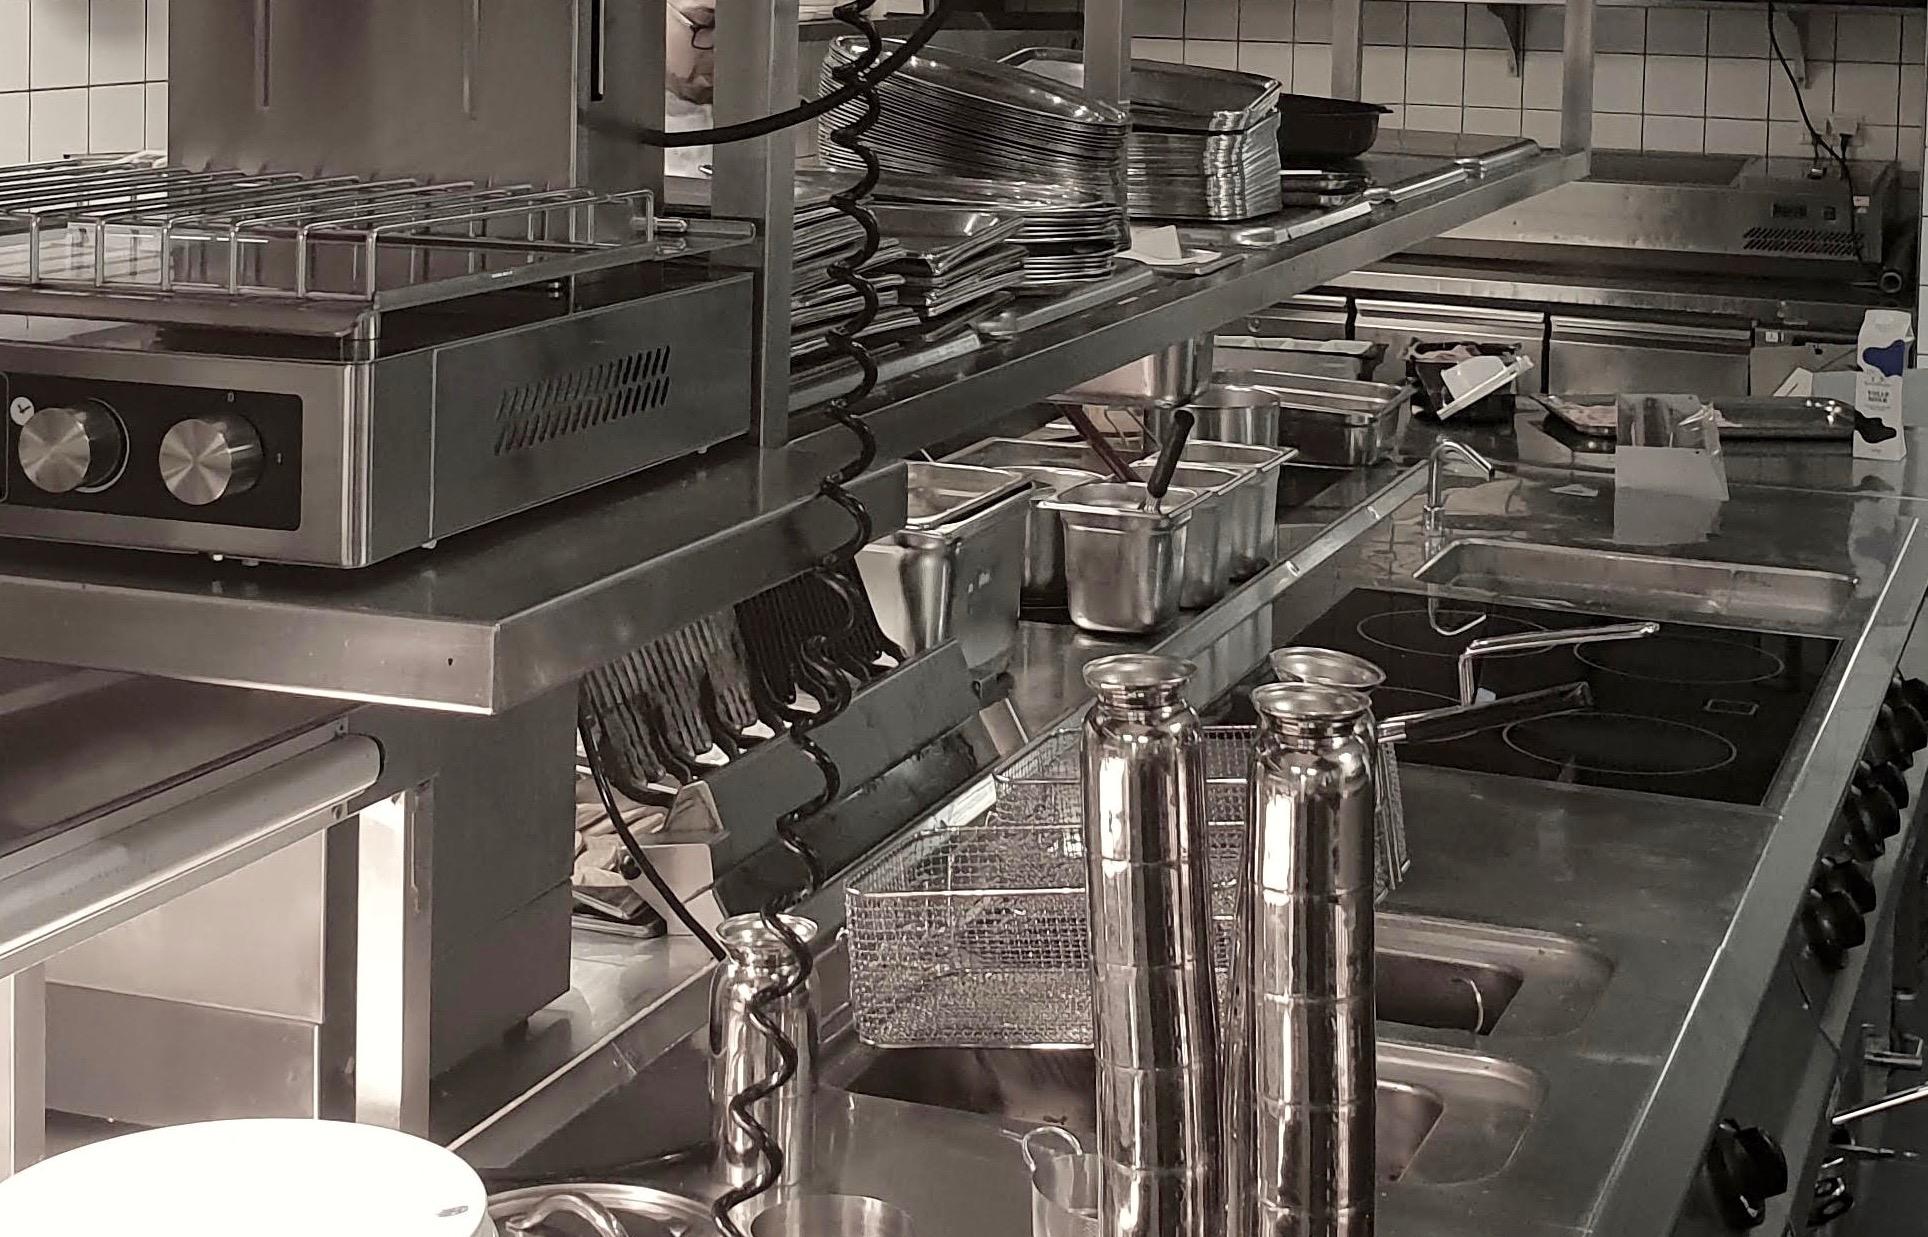 grootkeuken-techniek-horeca-apparatuur-grill-frituur-fornuis